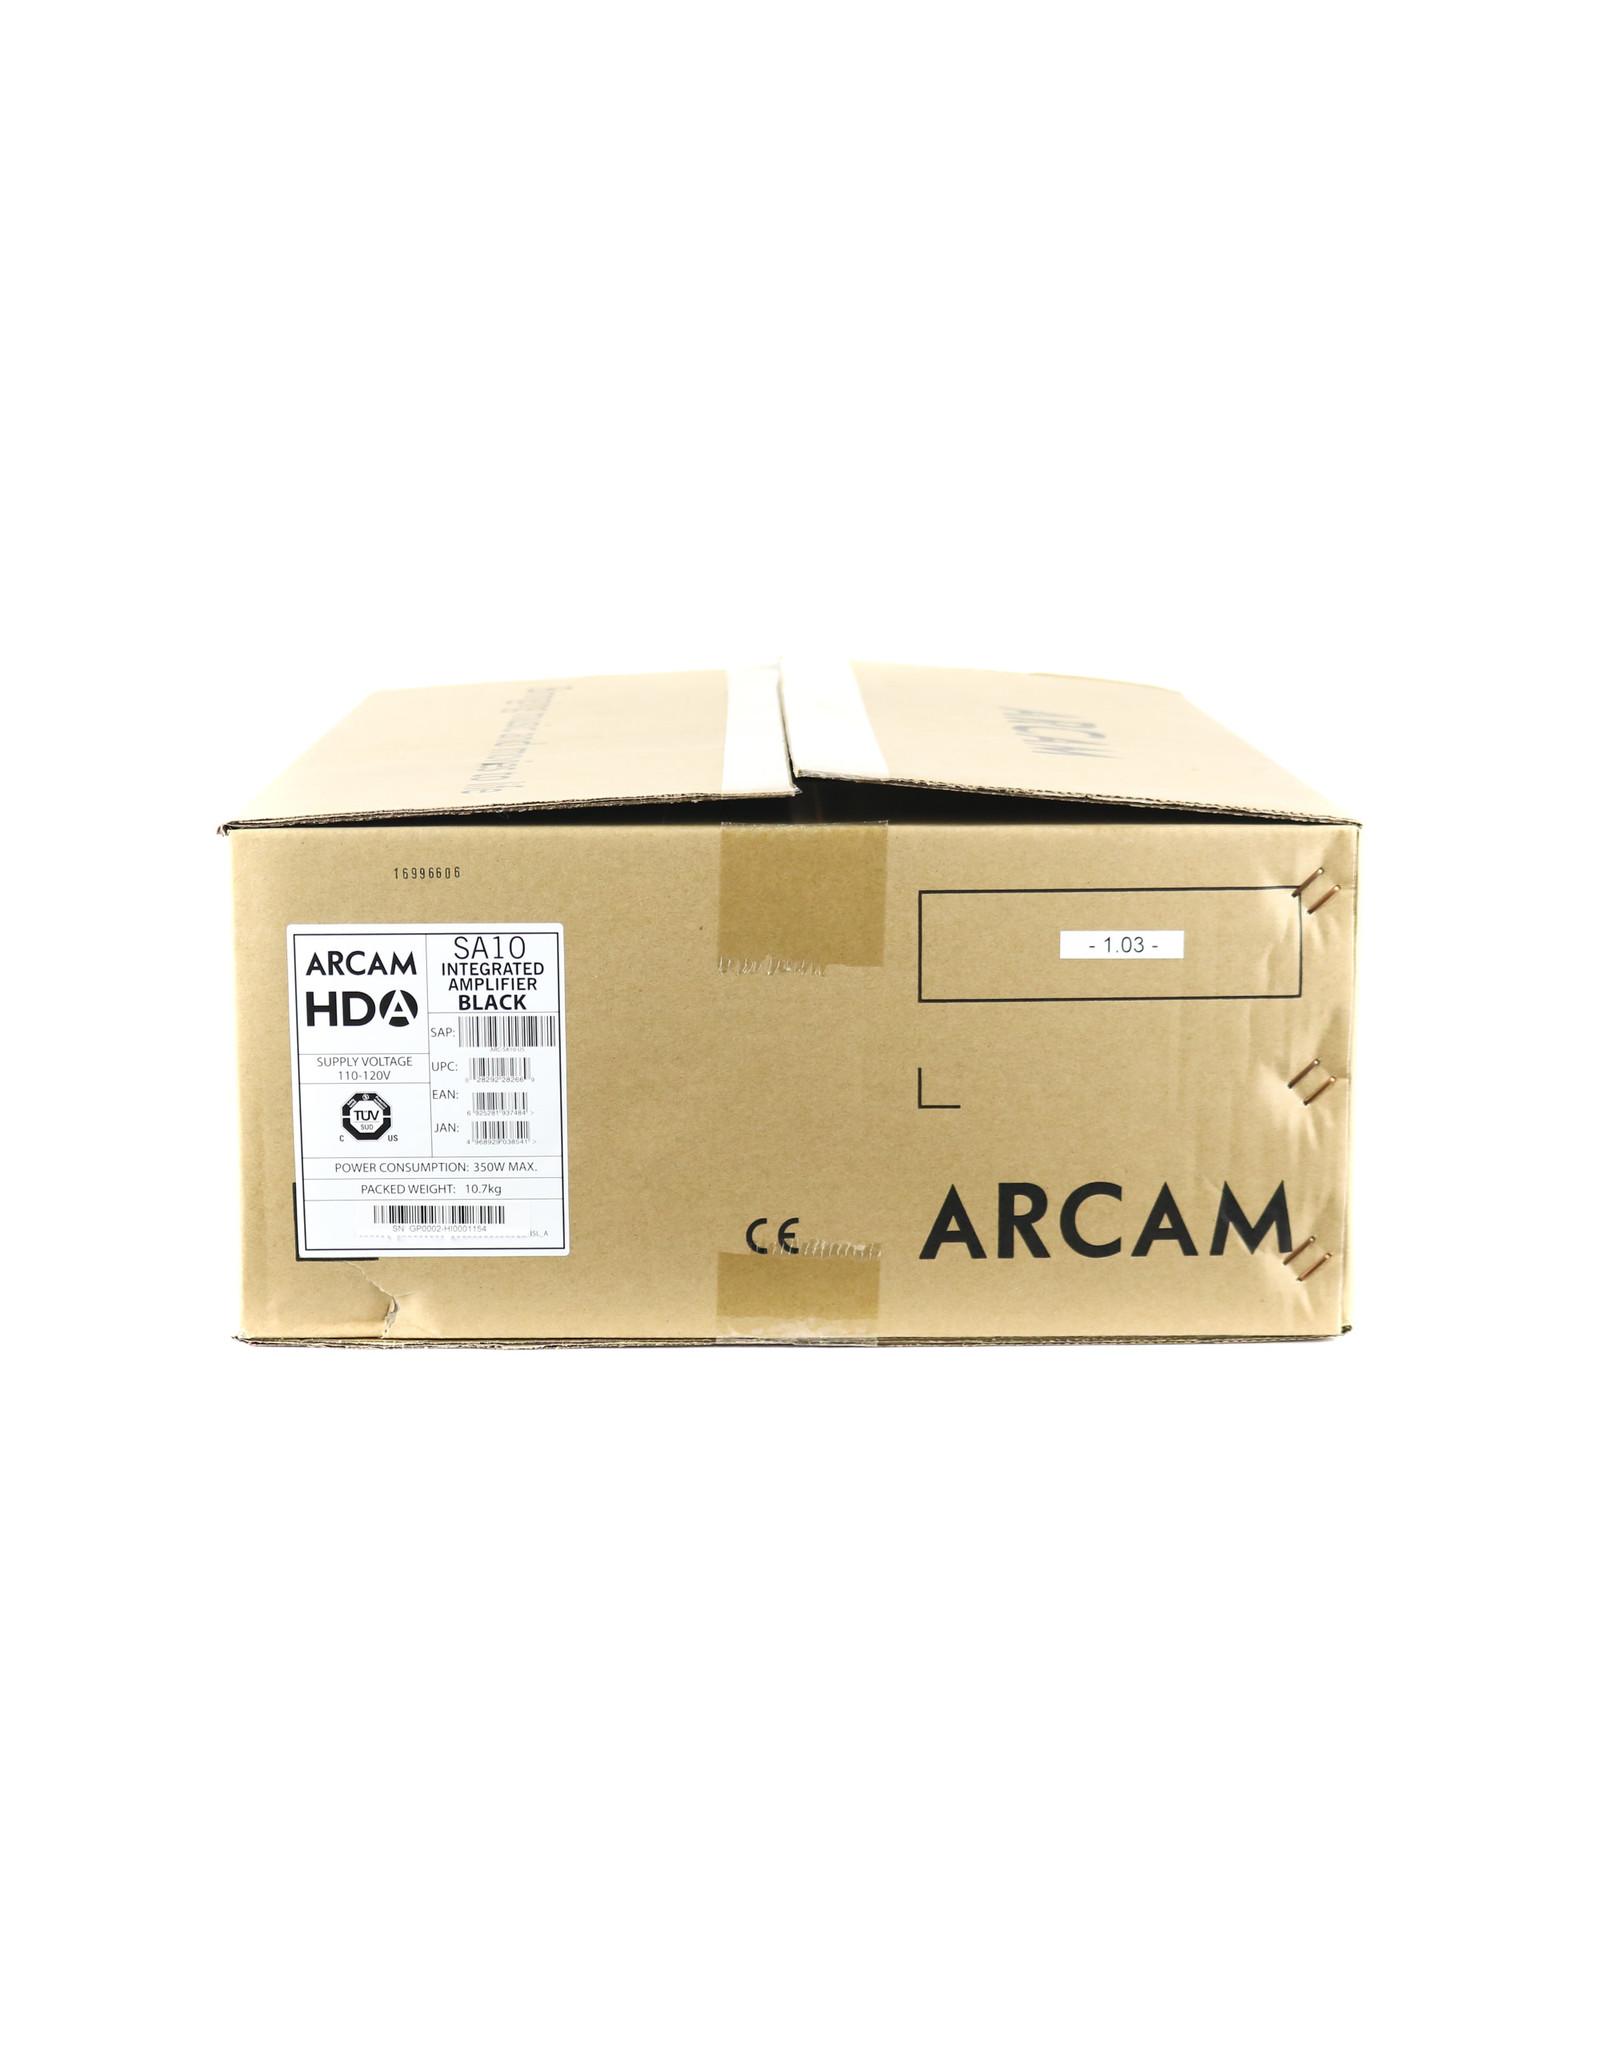 Arcam Arcam SA10 Integrated Amp USED